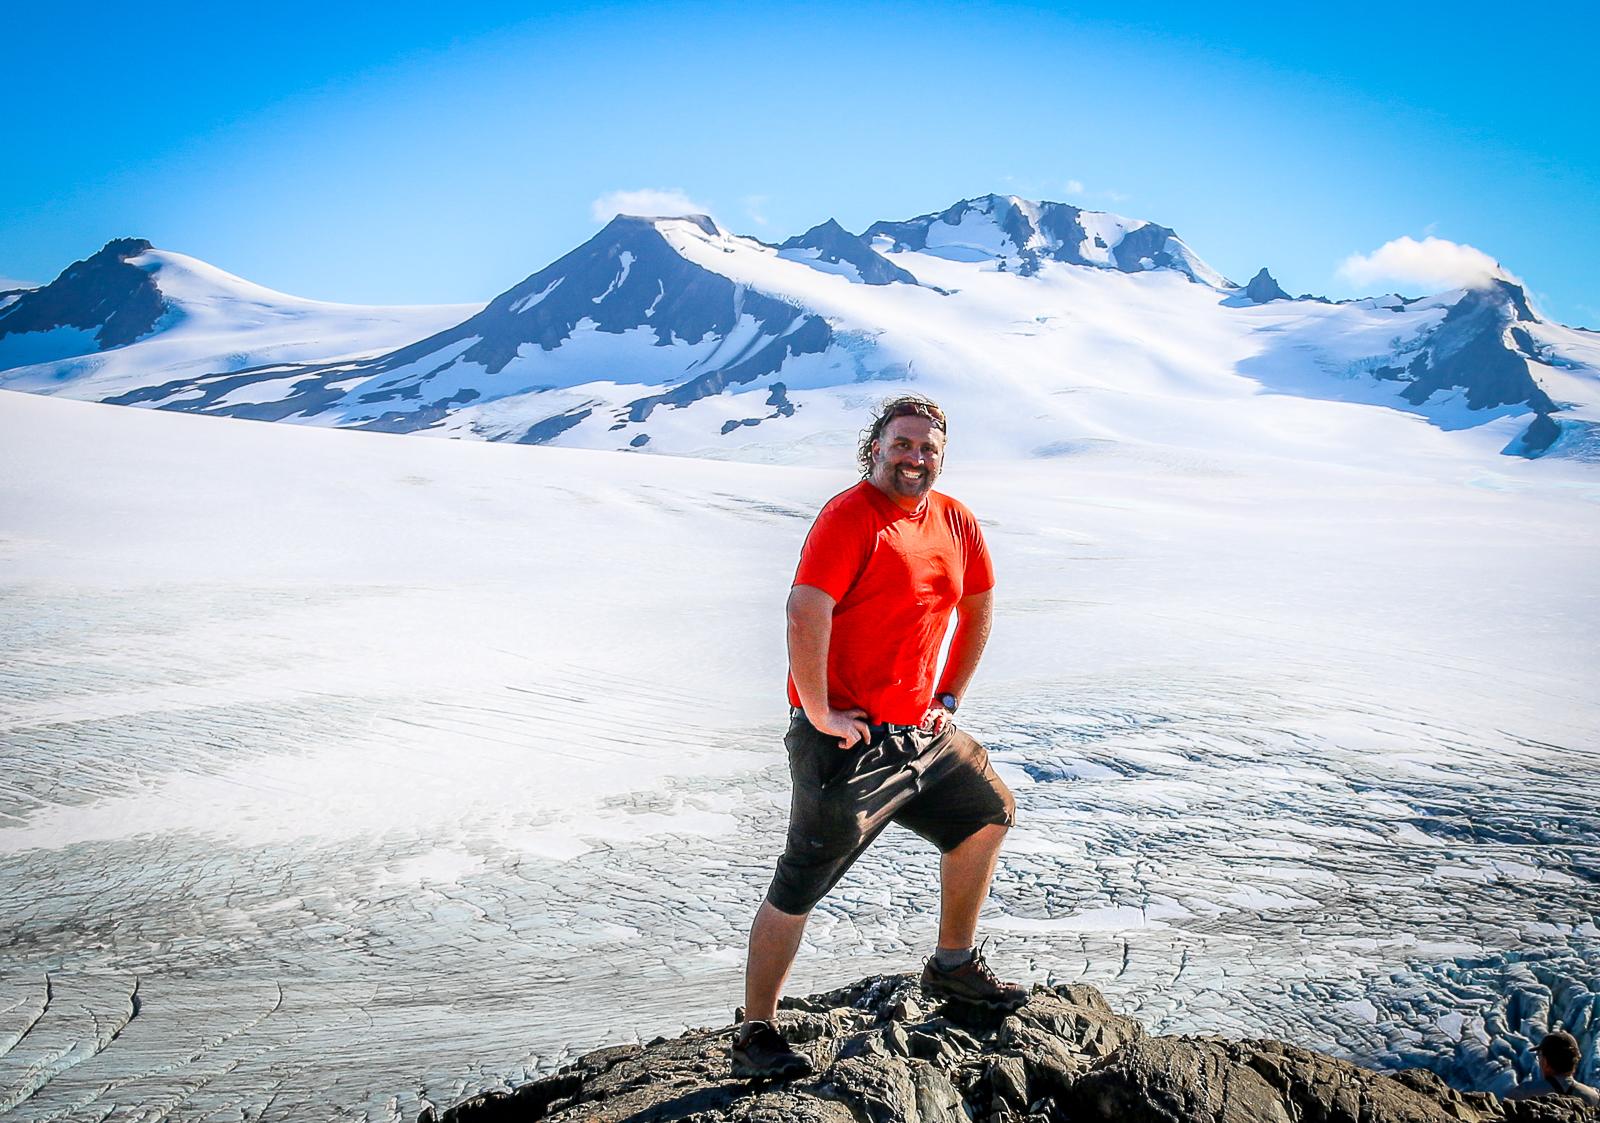 The Harding Icefields in Alaska